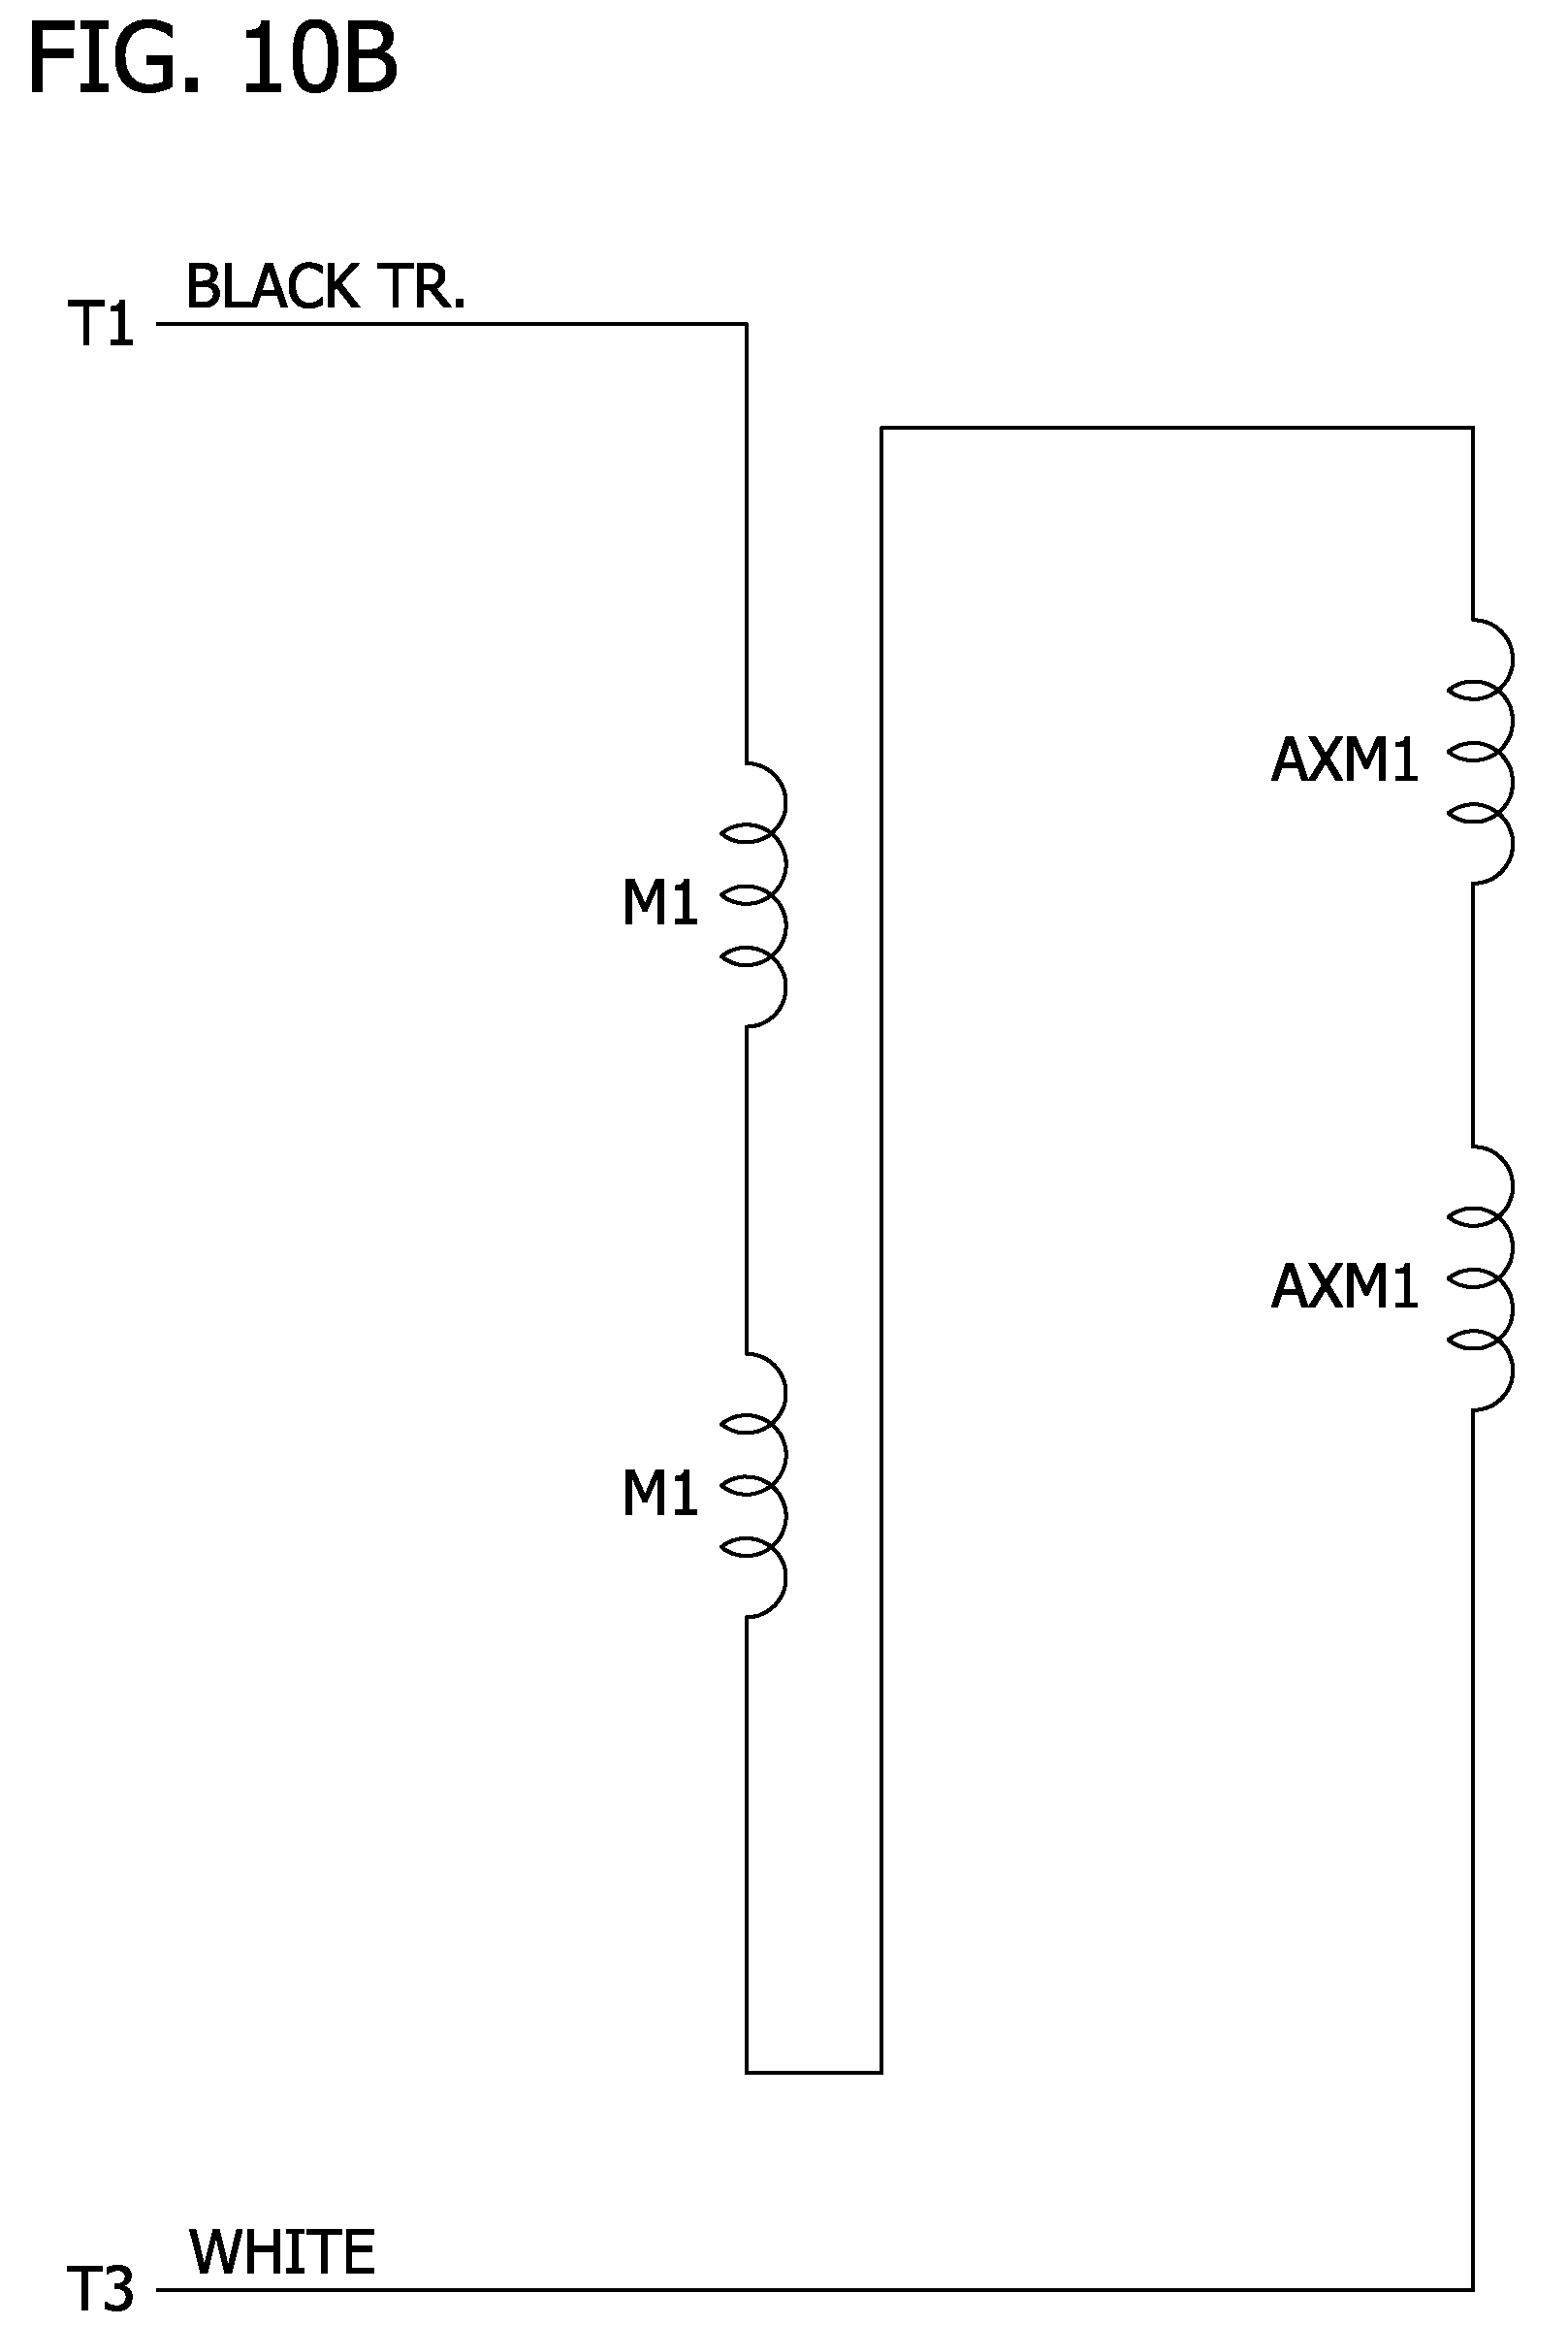 delco 09383075 wiring schematic model wiring diagram Delco Radio Wiring Diagram delco 09383075 wiring diagram wiring diagramdelco 09383075 wiring schematic model wiring librarydelco 09383075 wiring schematic model